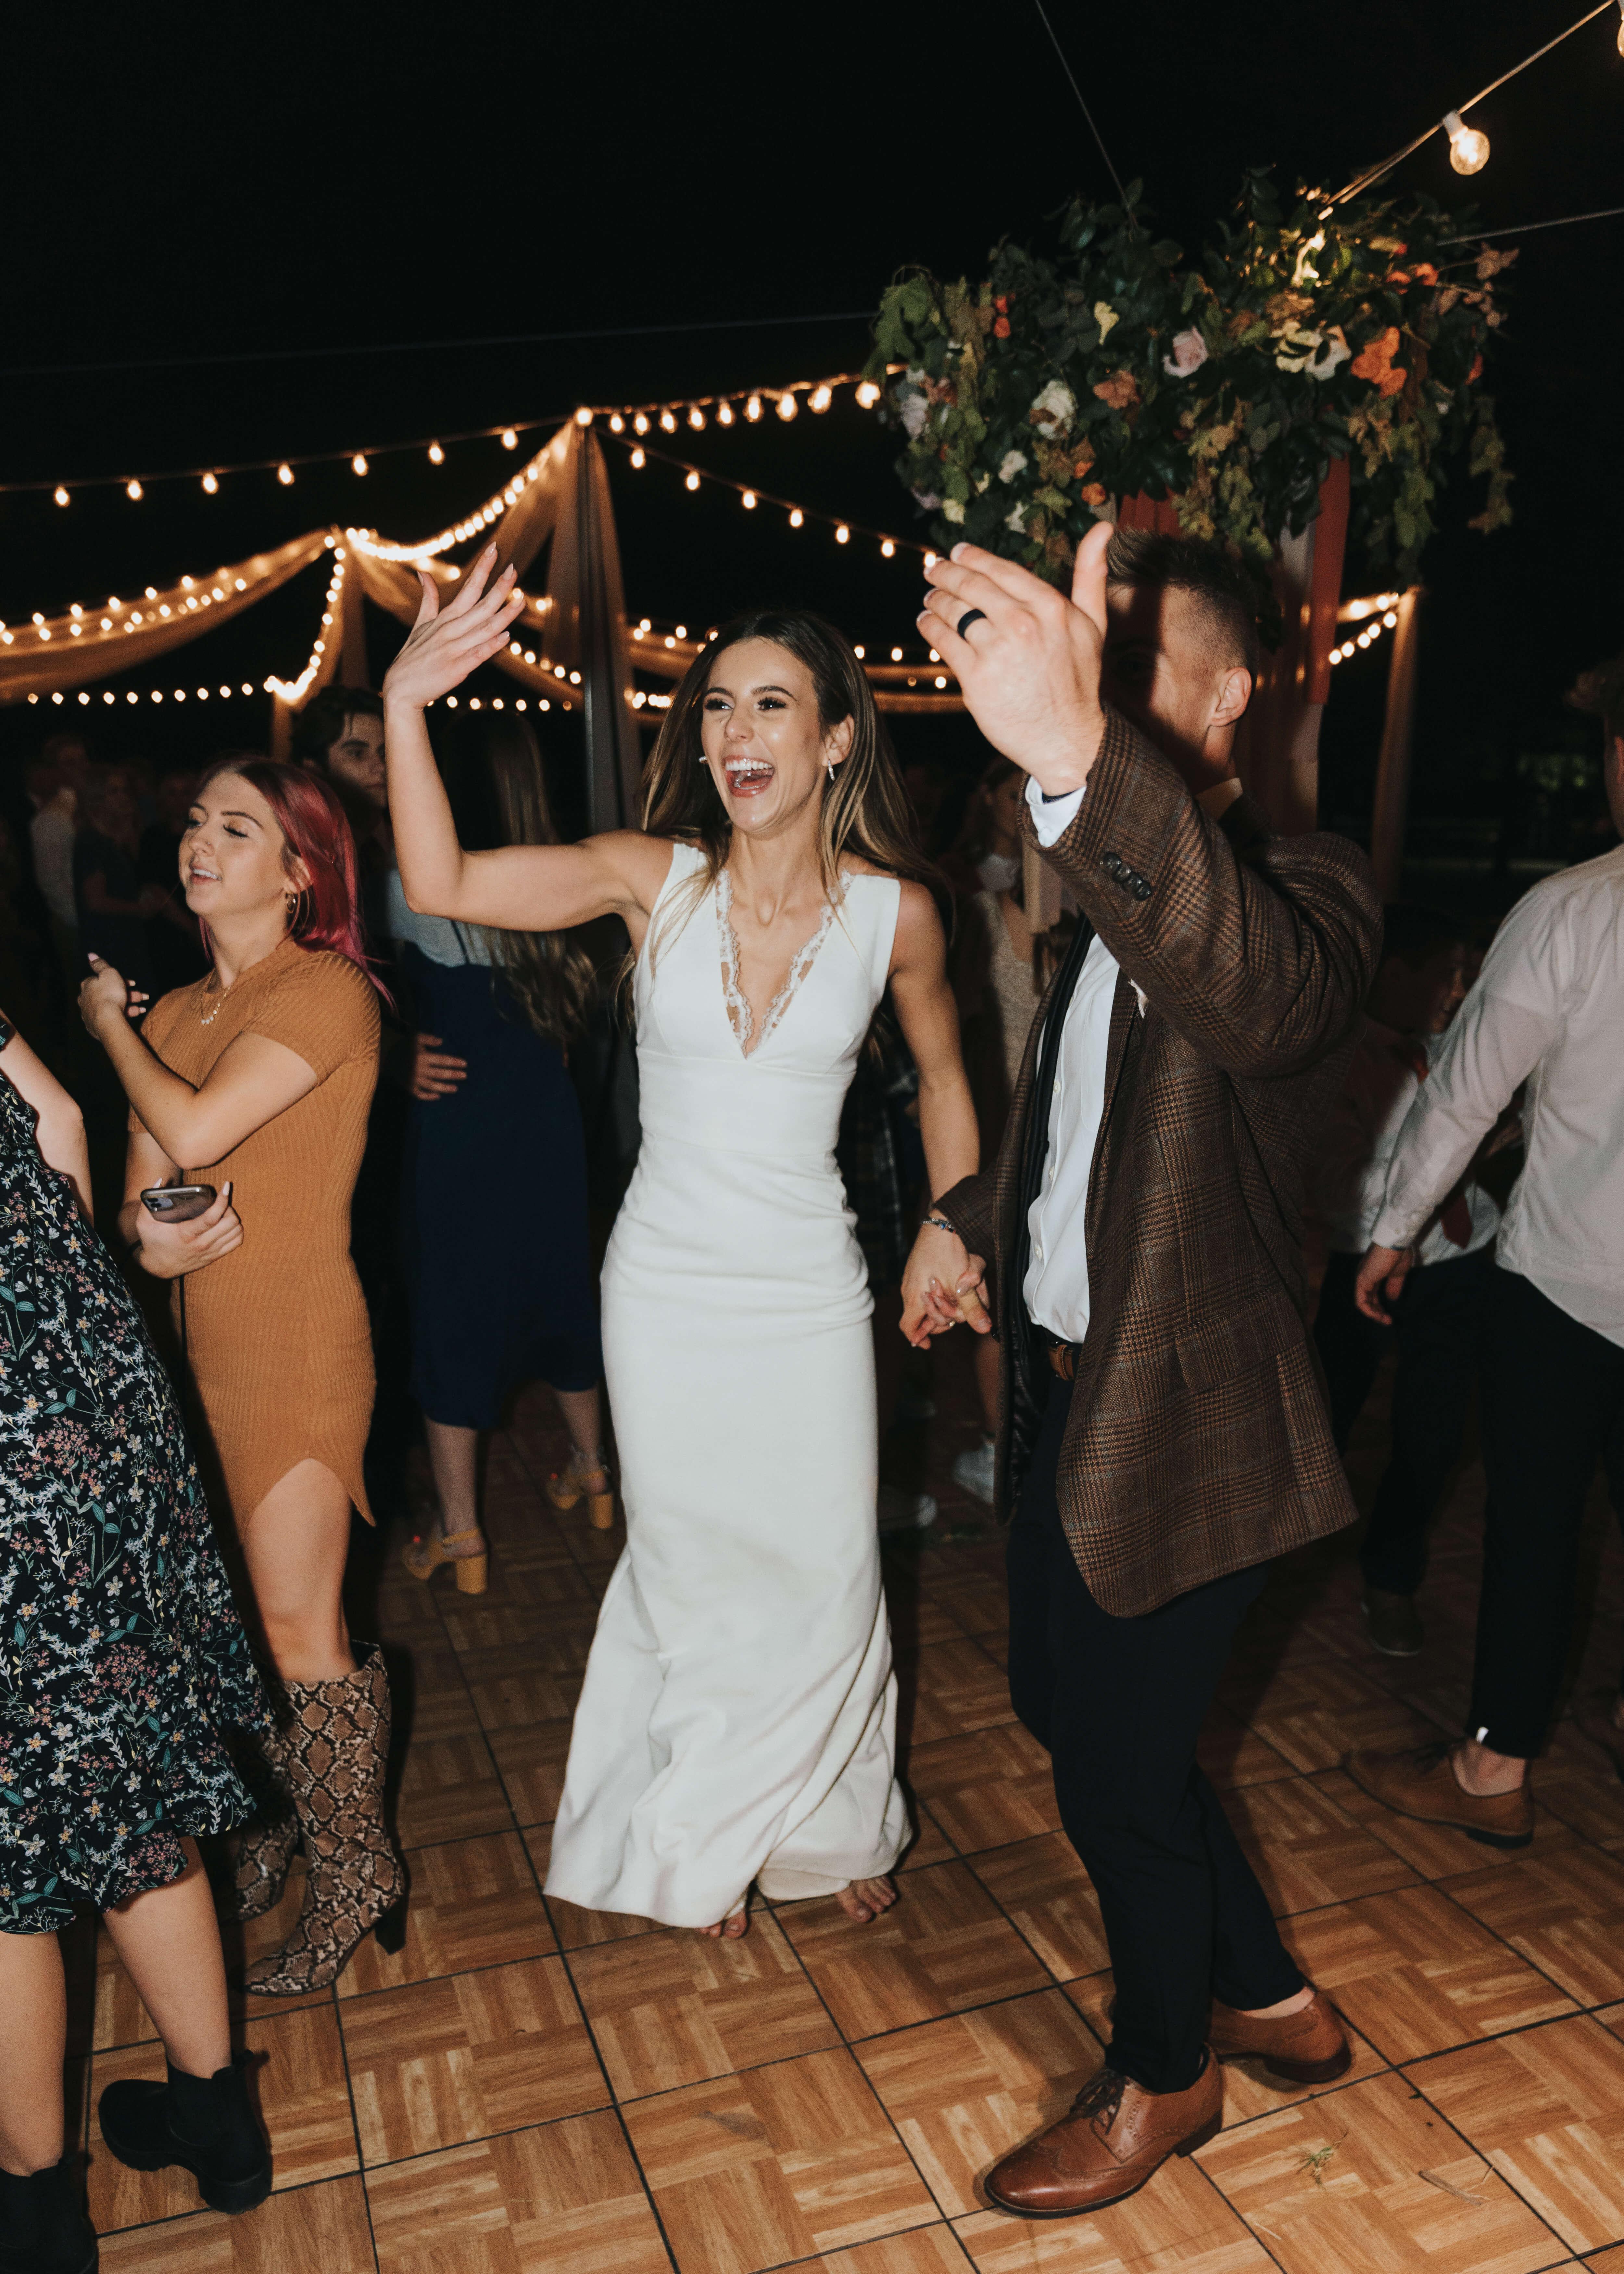 brida and groom dancing together on wedding day